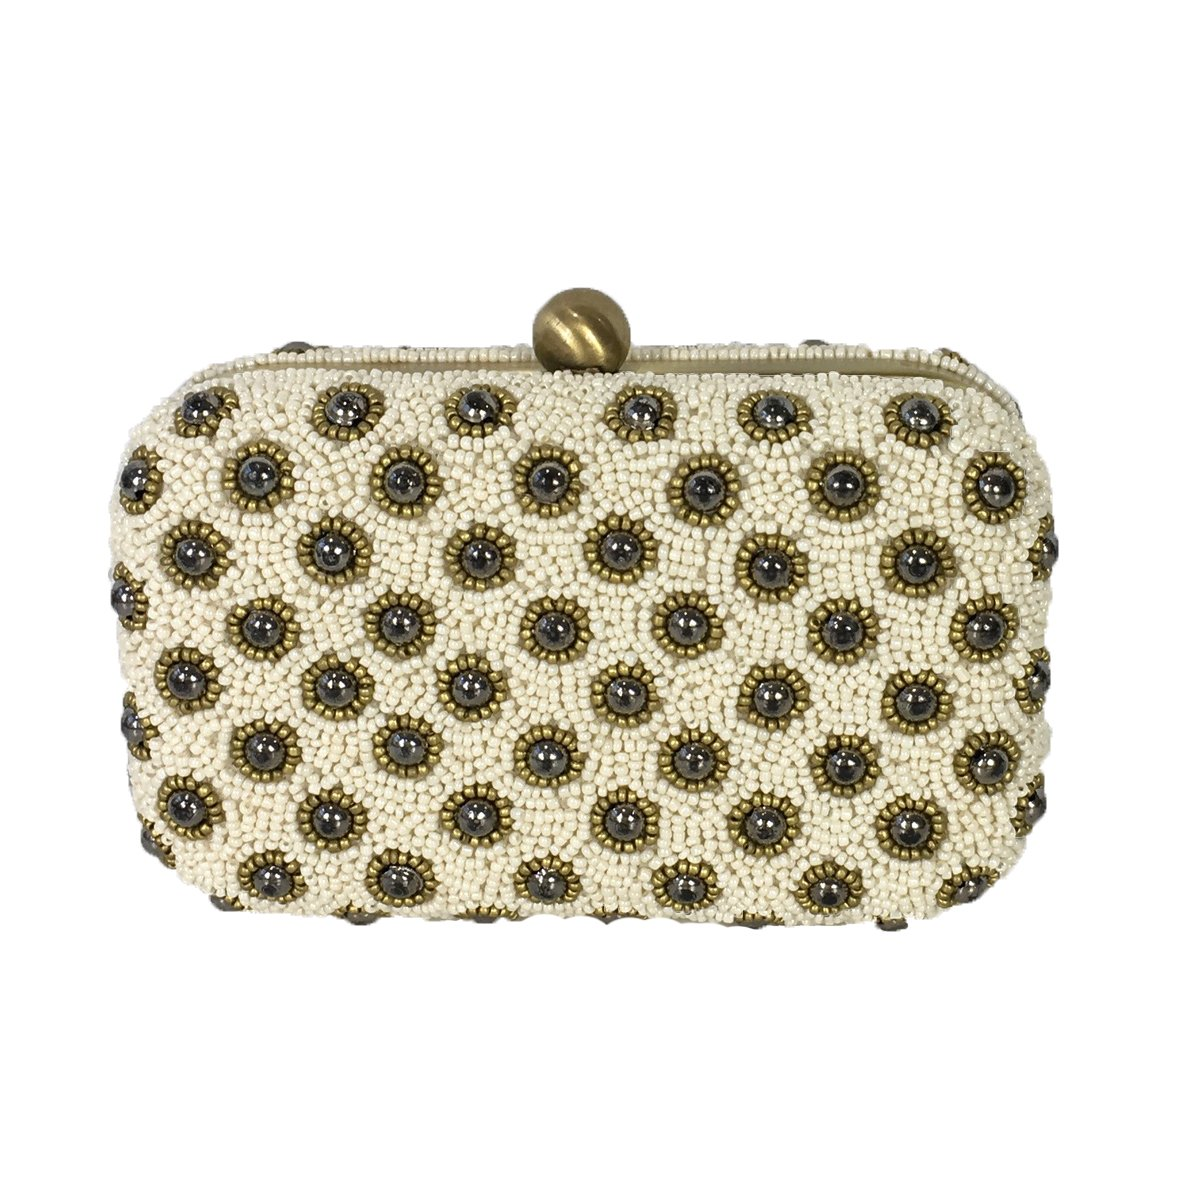 From St Xavier Daisy Beaded Box Clutch Evening Bag, Ivory Multi